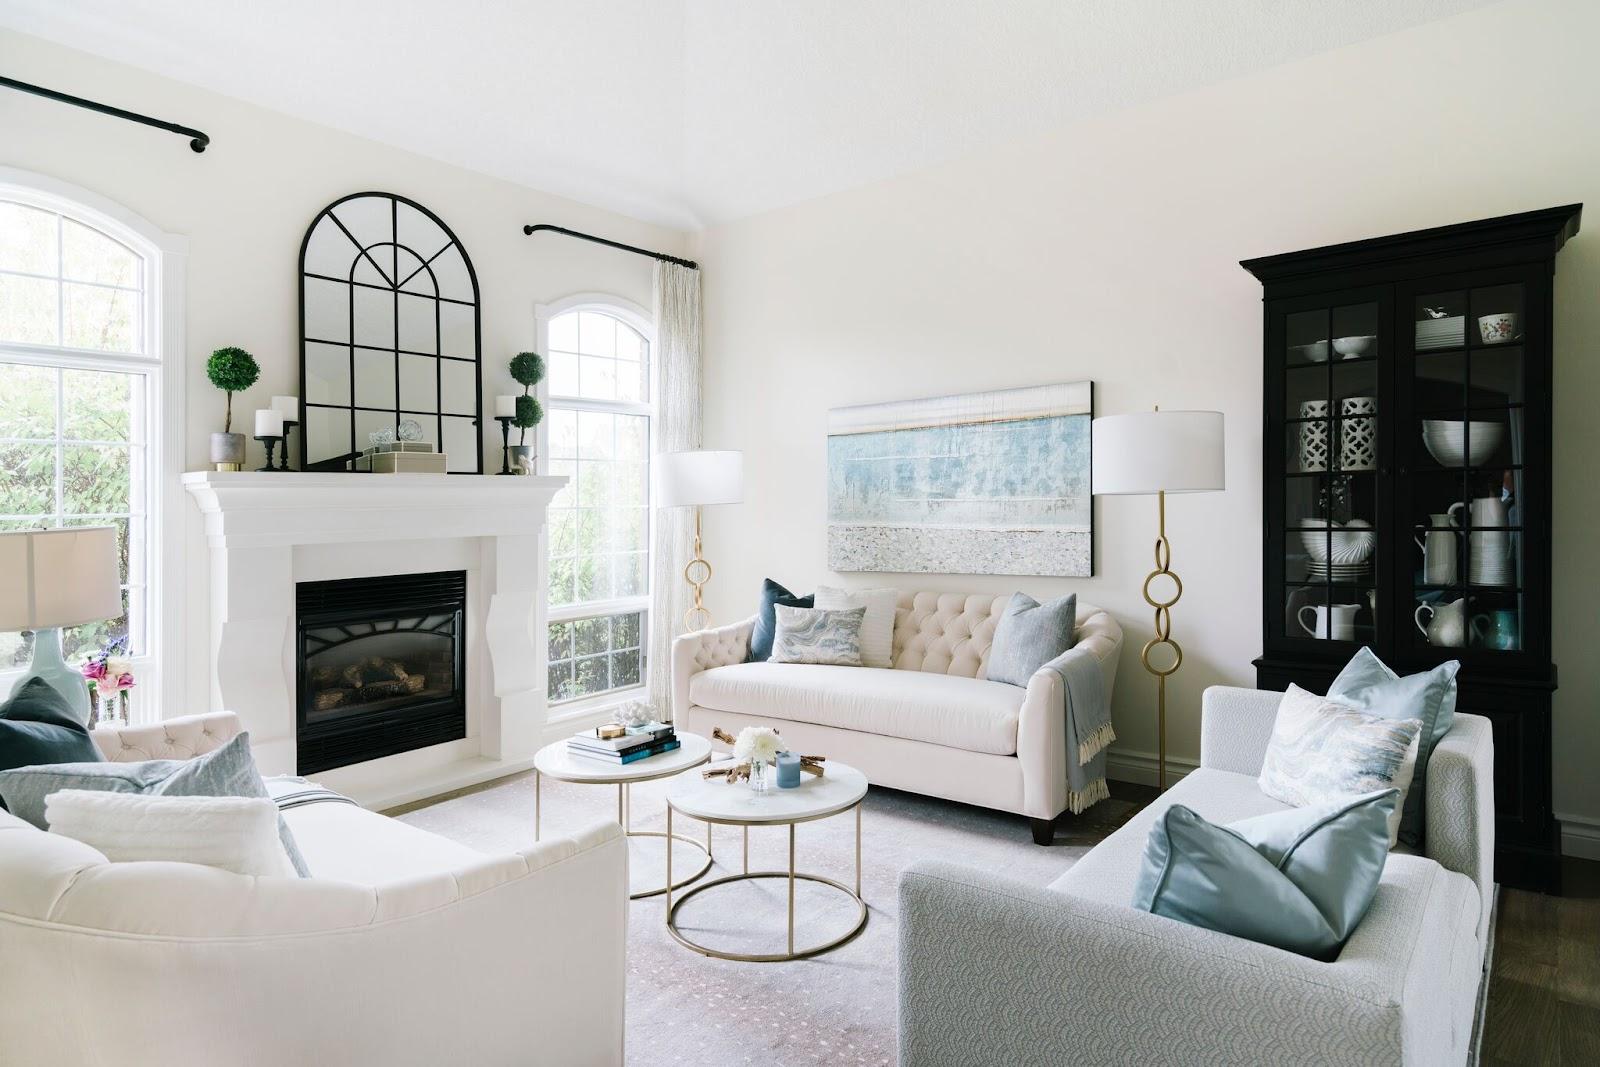 leanne bunnell interiors turnkey design service living room window pane mirror fireplace black hutch art calgary